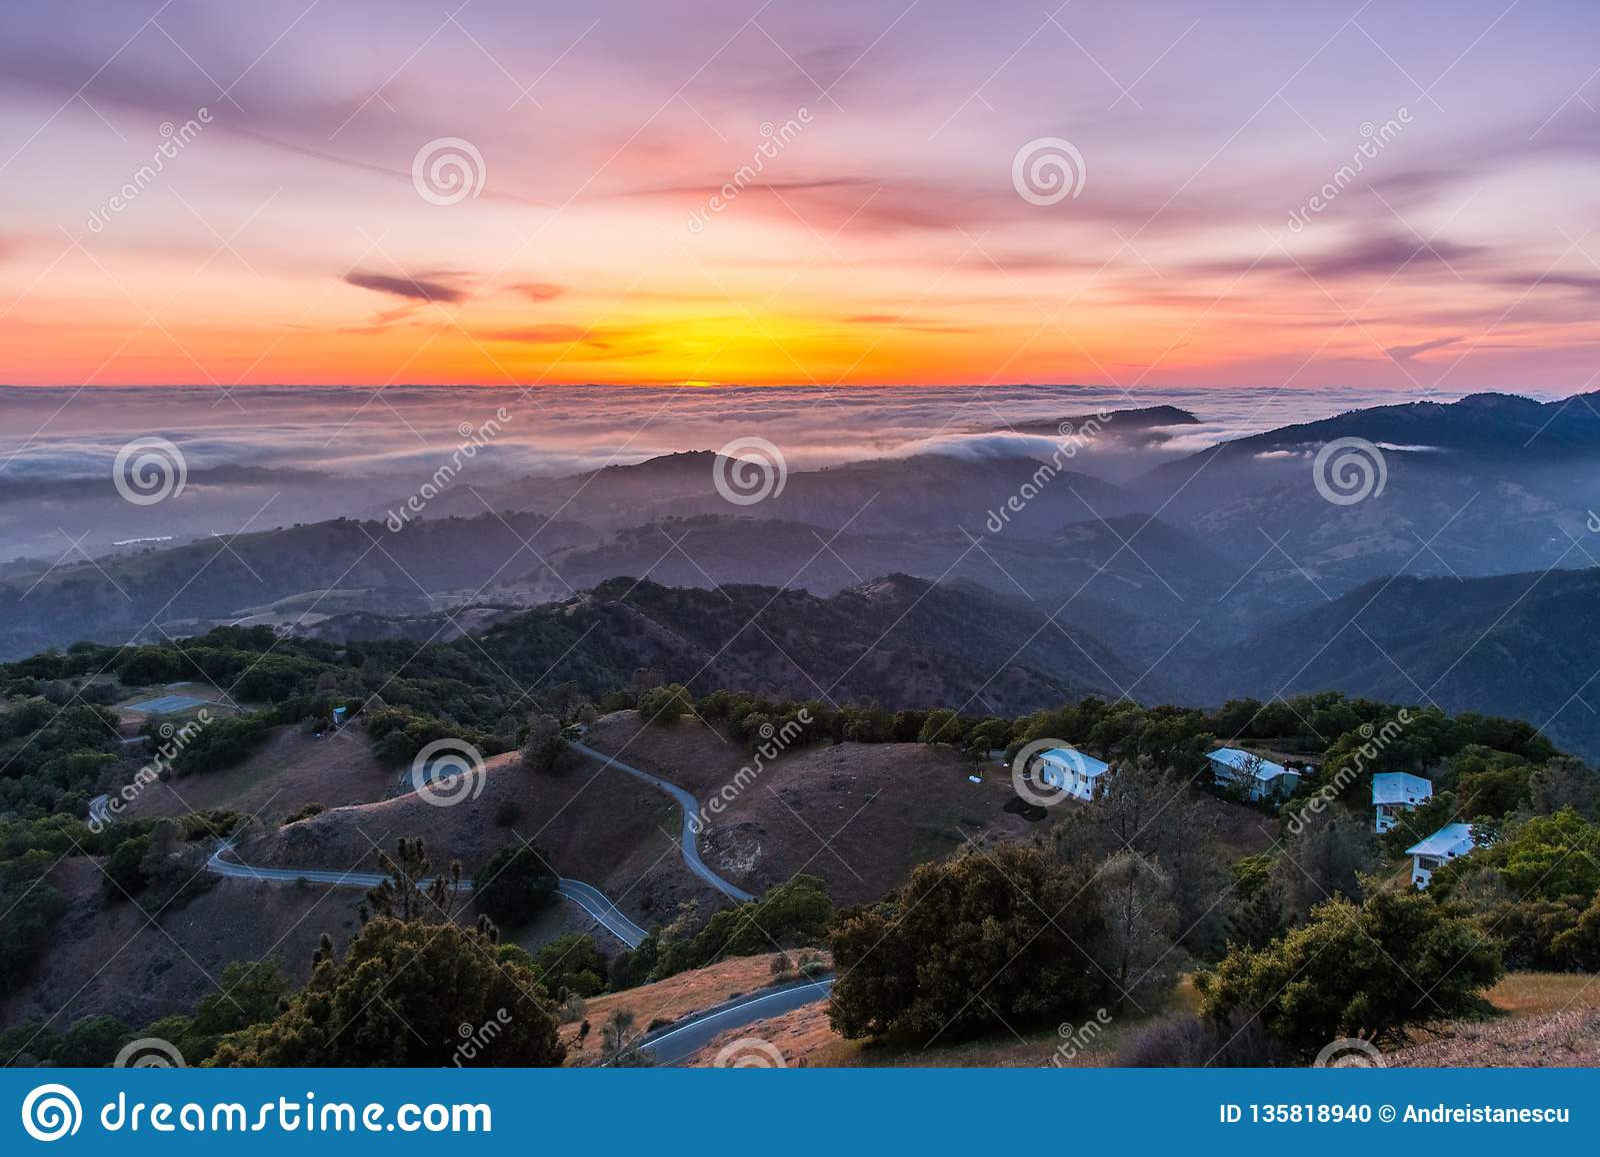 Posluminiscencia de la puesta del sol sobre un mar de nubes; carretera con curvas que desciende a través de Rolling Hills en el p